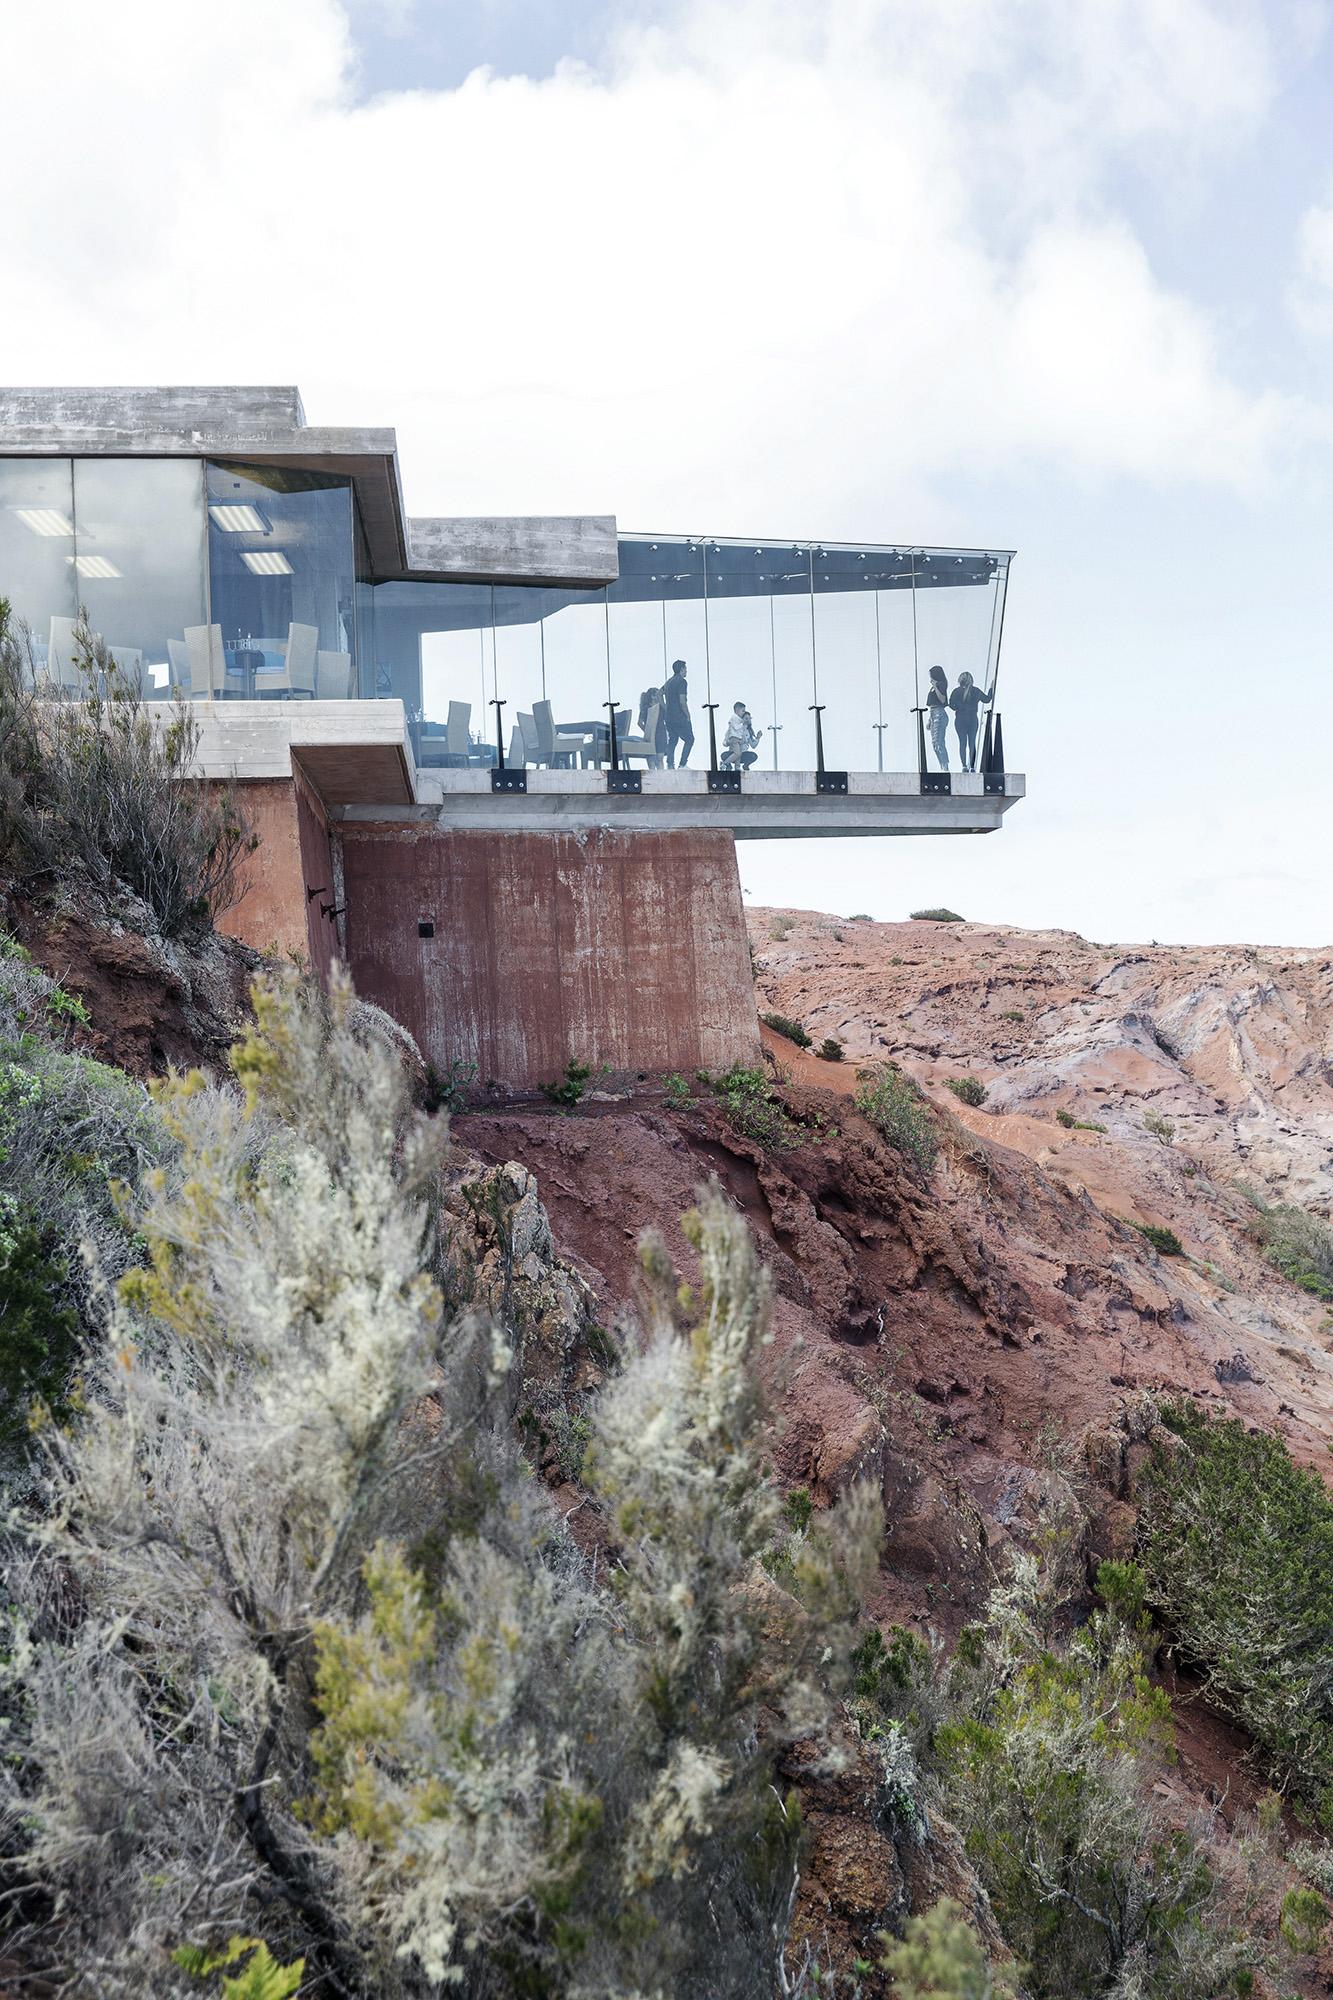 The mirador near La Hermigua in La Gomera in the Canary Islands by Rebecca Stumpf, Boulder, Denver, Colorado Lifestyle, Travel, Food Editorial and Commercial Photographer.